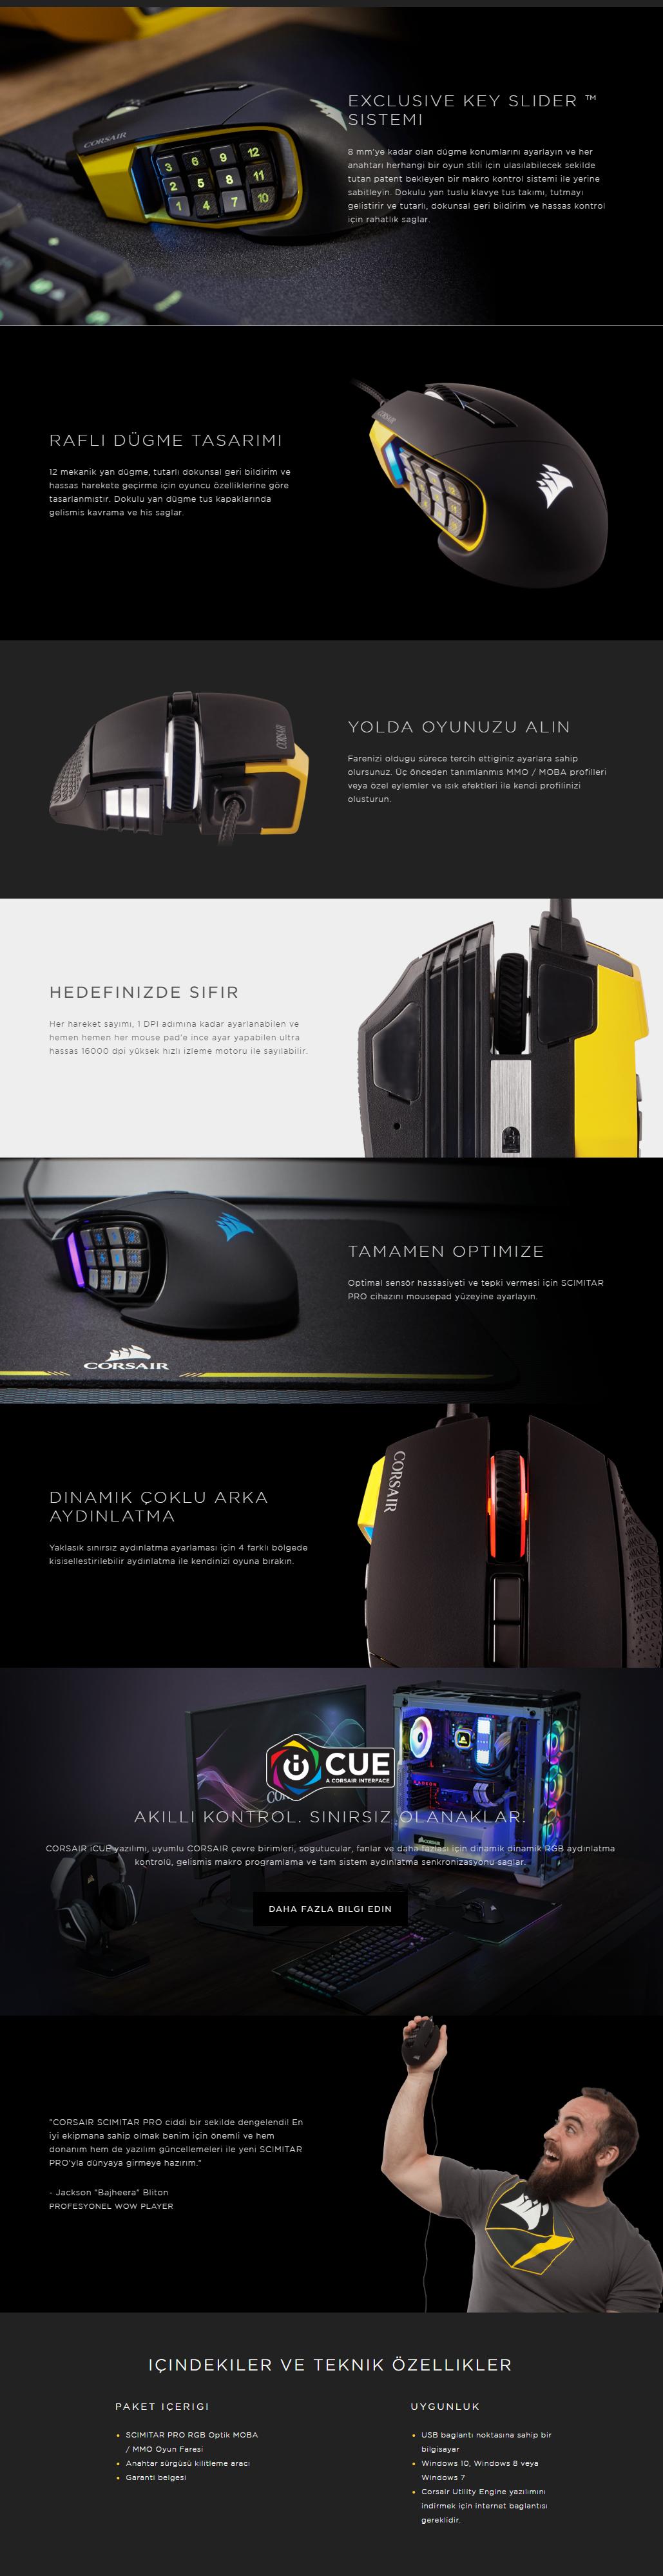 Corsair Gaming Scimitar Pro RGB Optik DPI Siyah Oyuncu Mouse